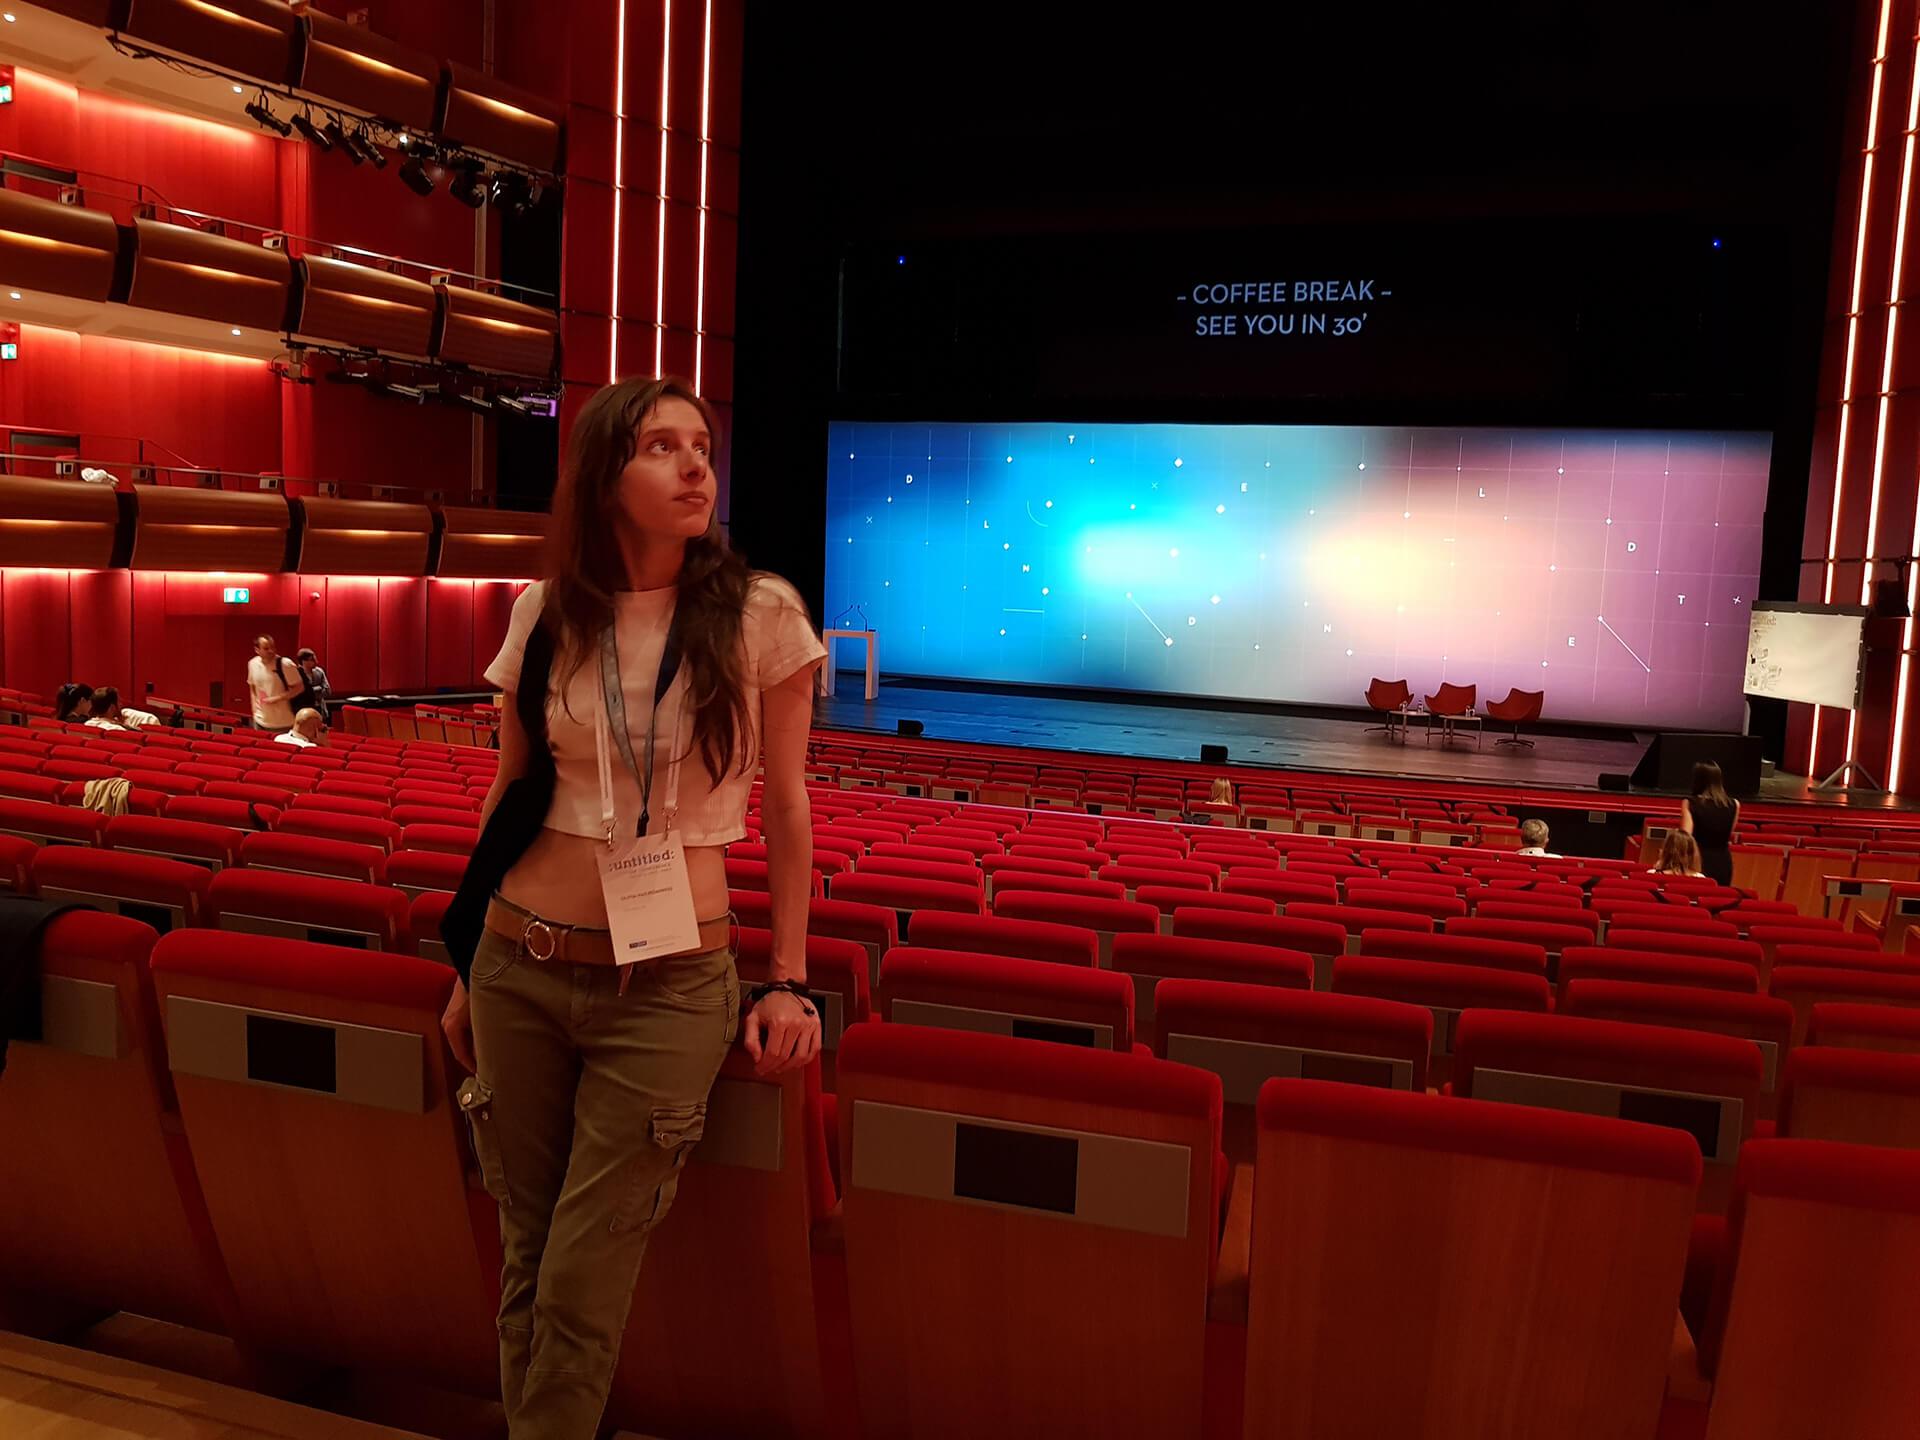 Olivia Hadjiioannou, Ολίβια Χατζηιωάννου, Oh., Press photos, Official Photos, Music, News, Greece, metal, Rock